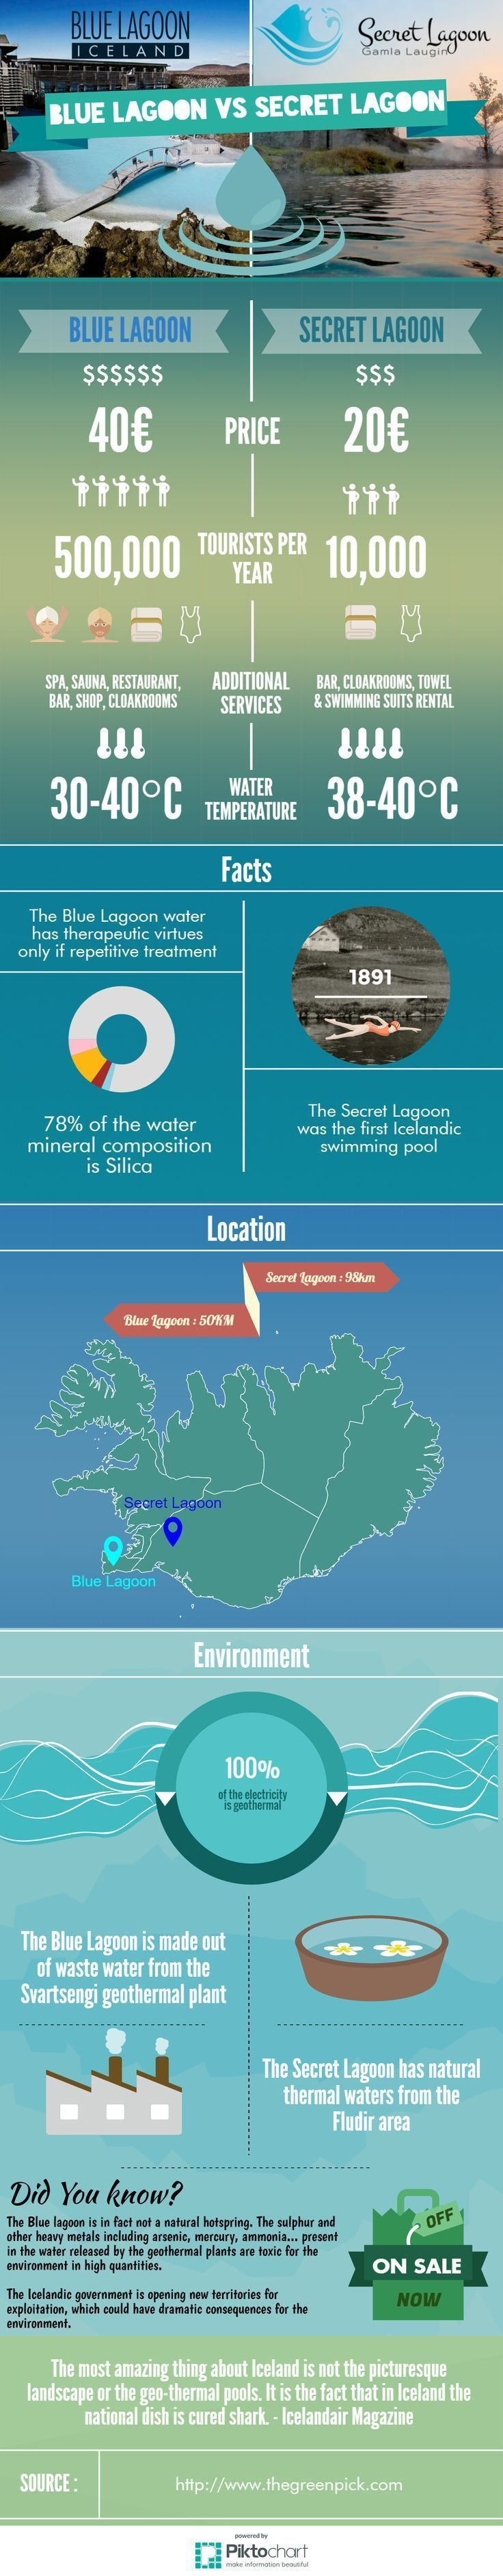 Iceland: the Blue Lagoon vs the Secret Lagoon